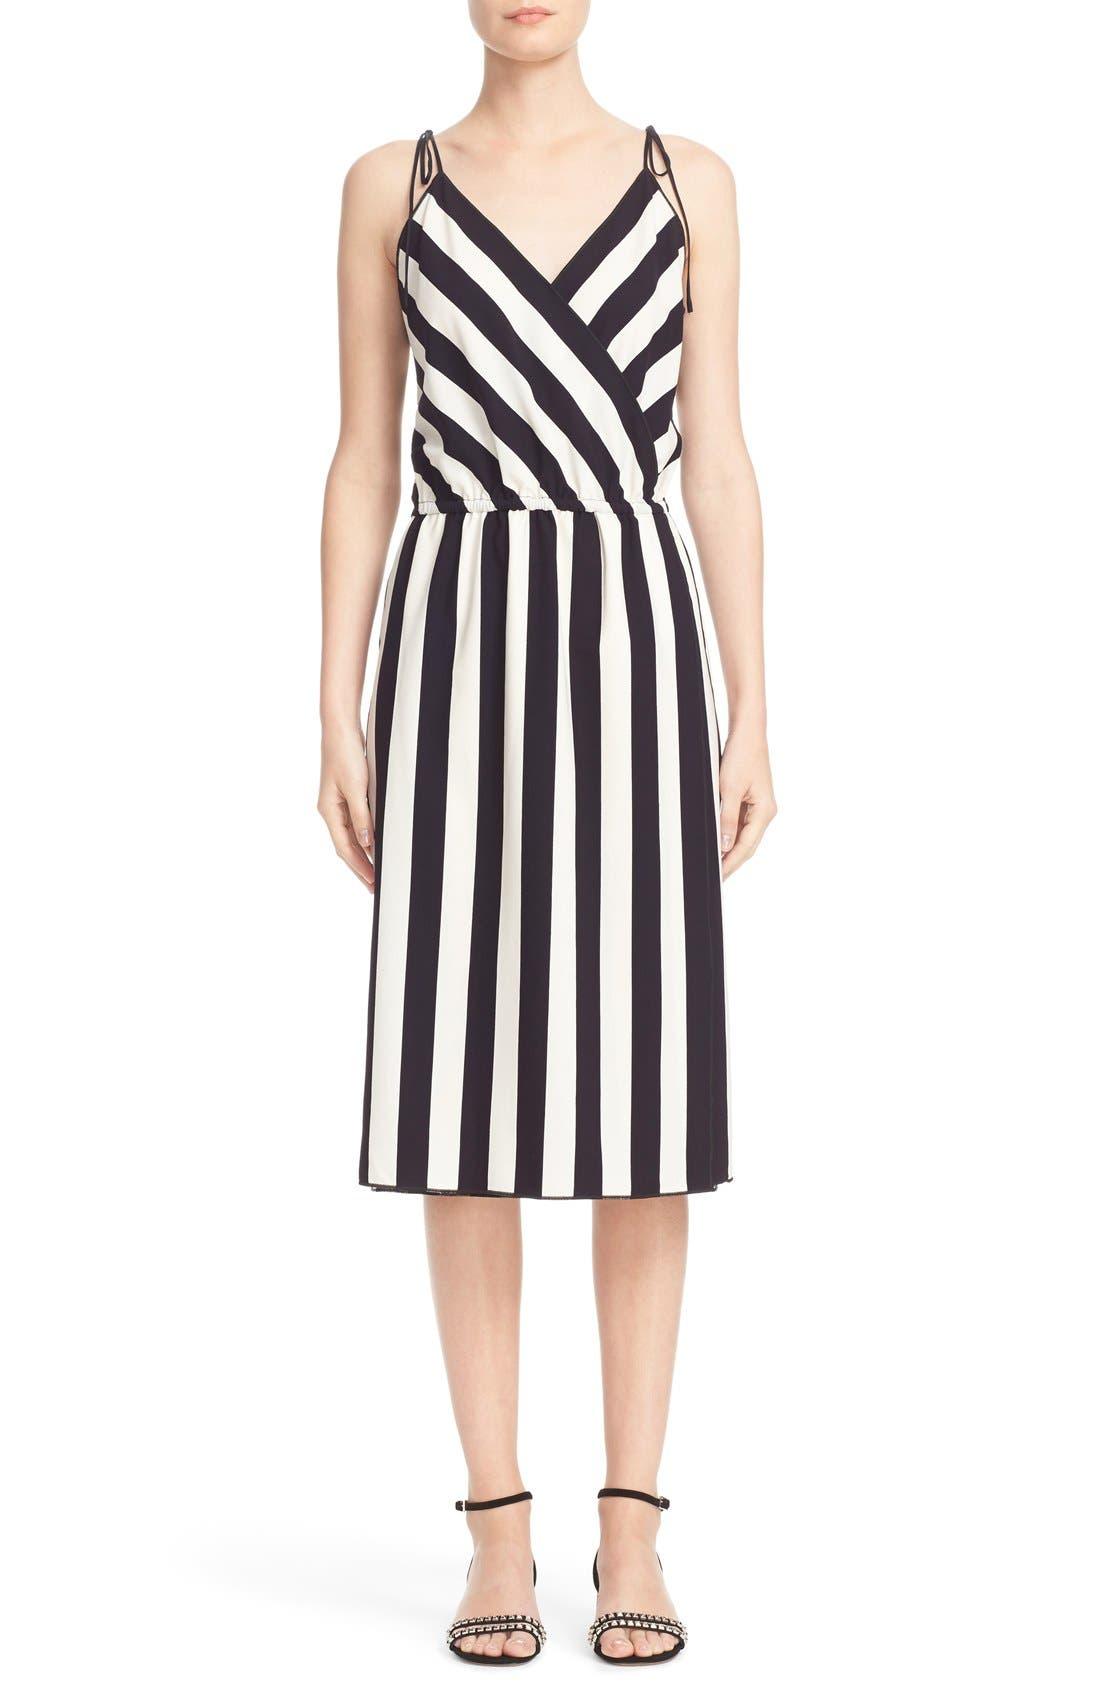 MARC JACOBS Stripe Crepe Surplice Dress